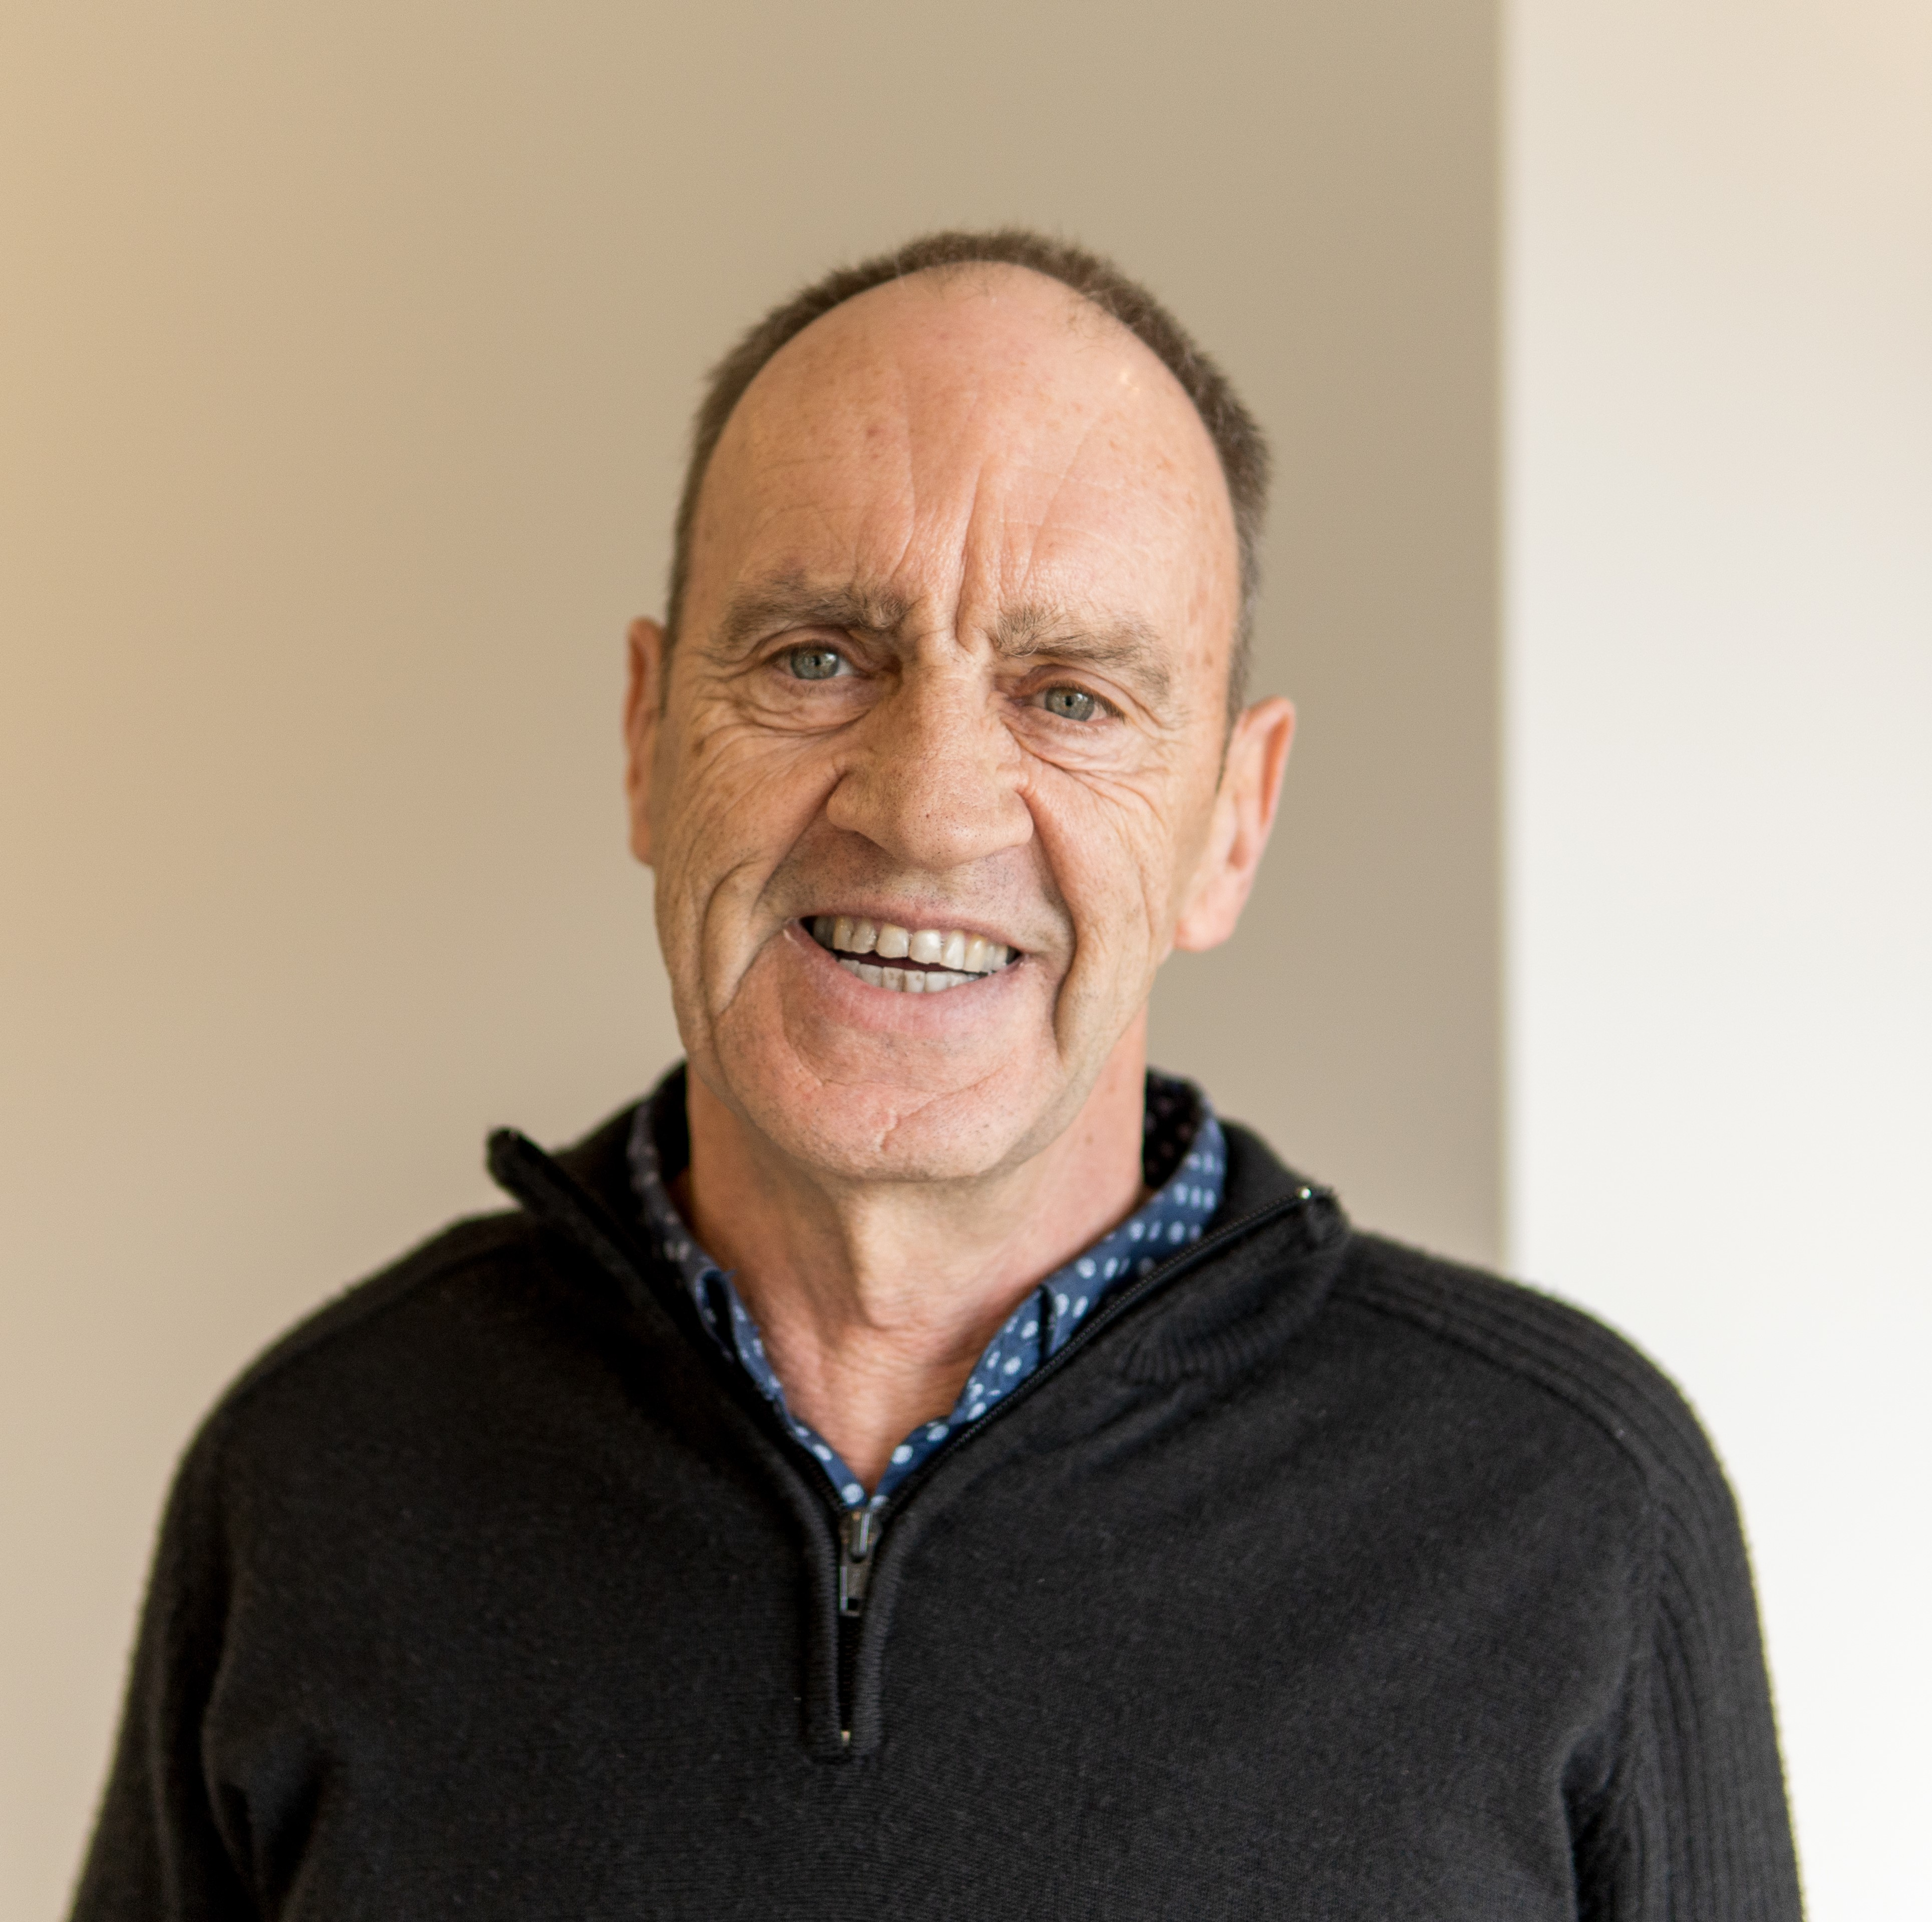 Garry Musson